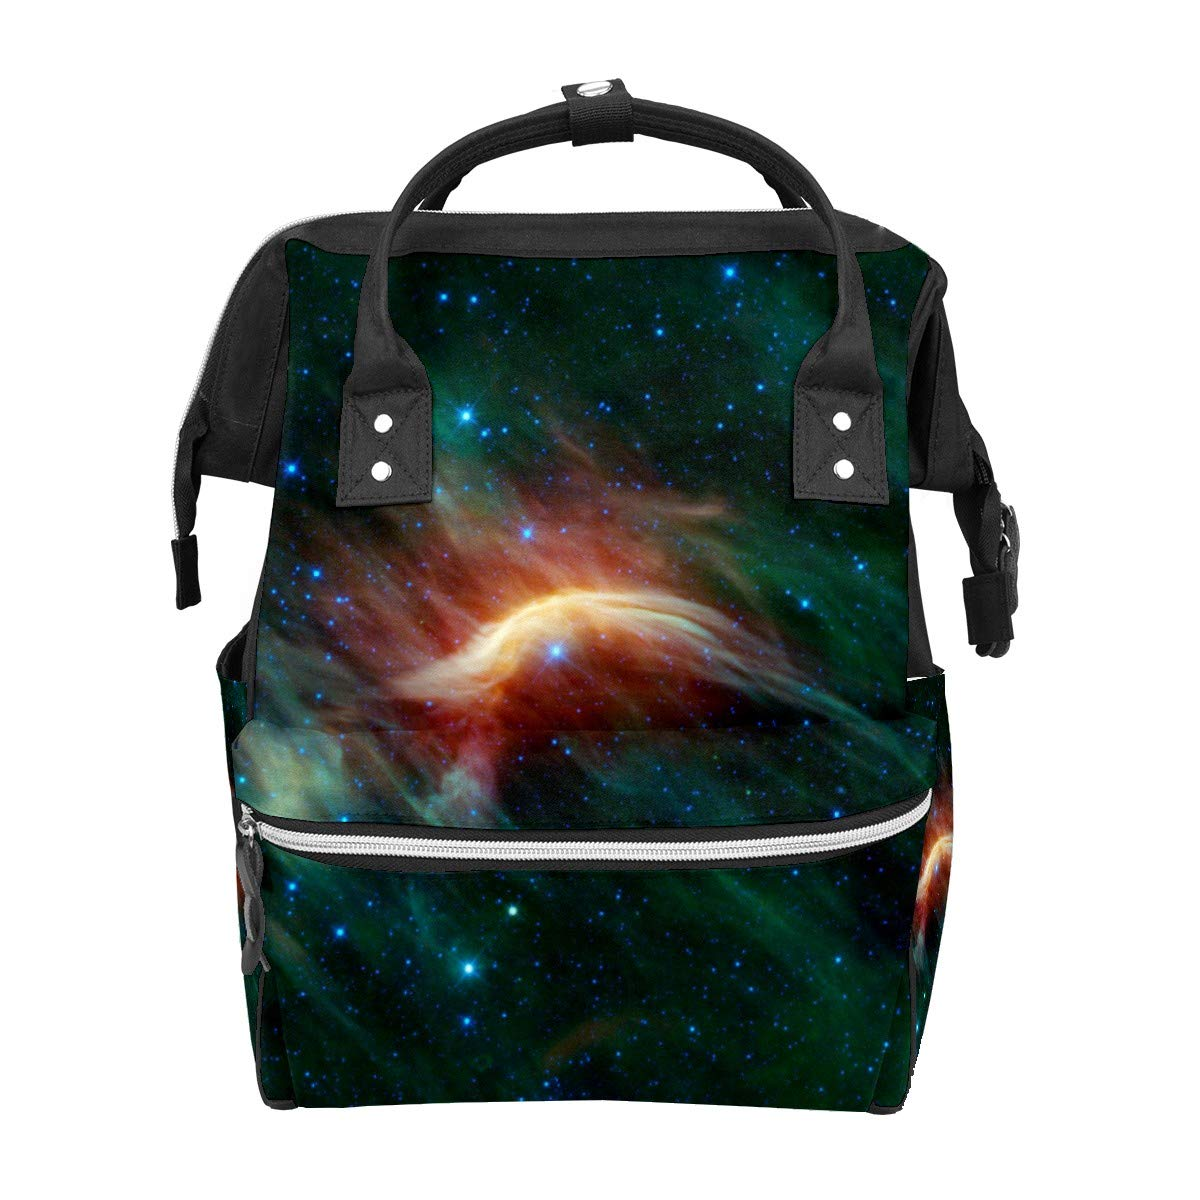 Diaper Bag Backpack Star Interstellar Universe Space Multifunction Travel Back Pack Baby Changing Bags Large Capacity Waterproof Stylish